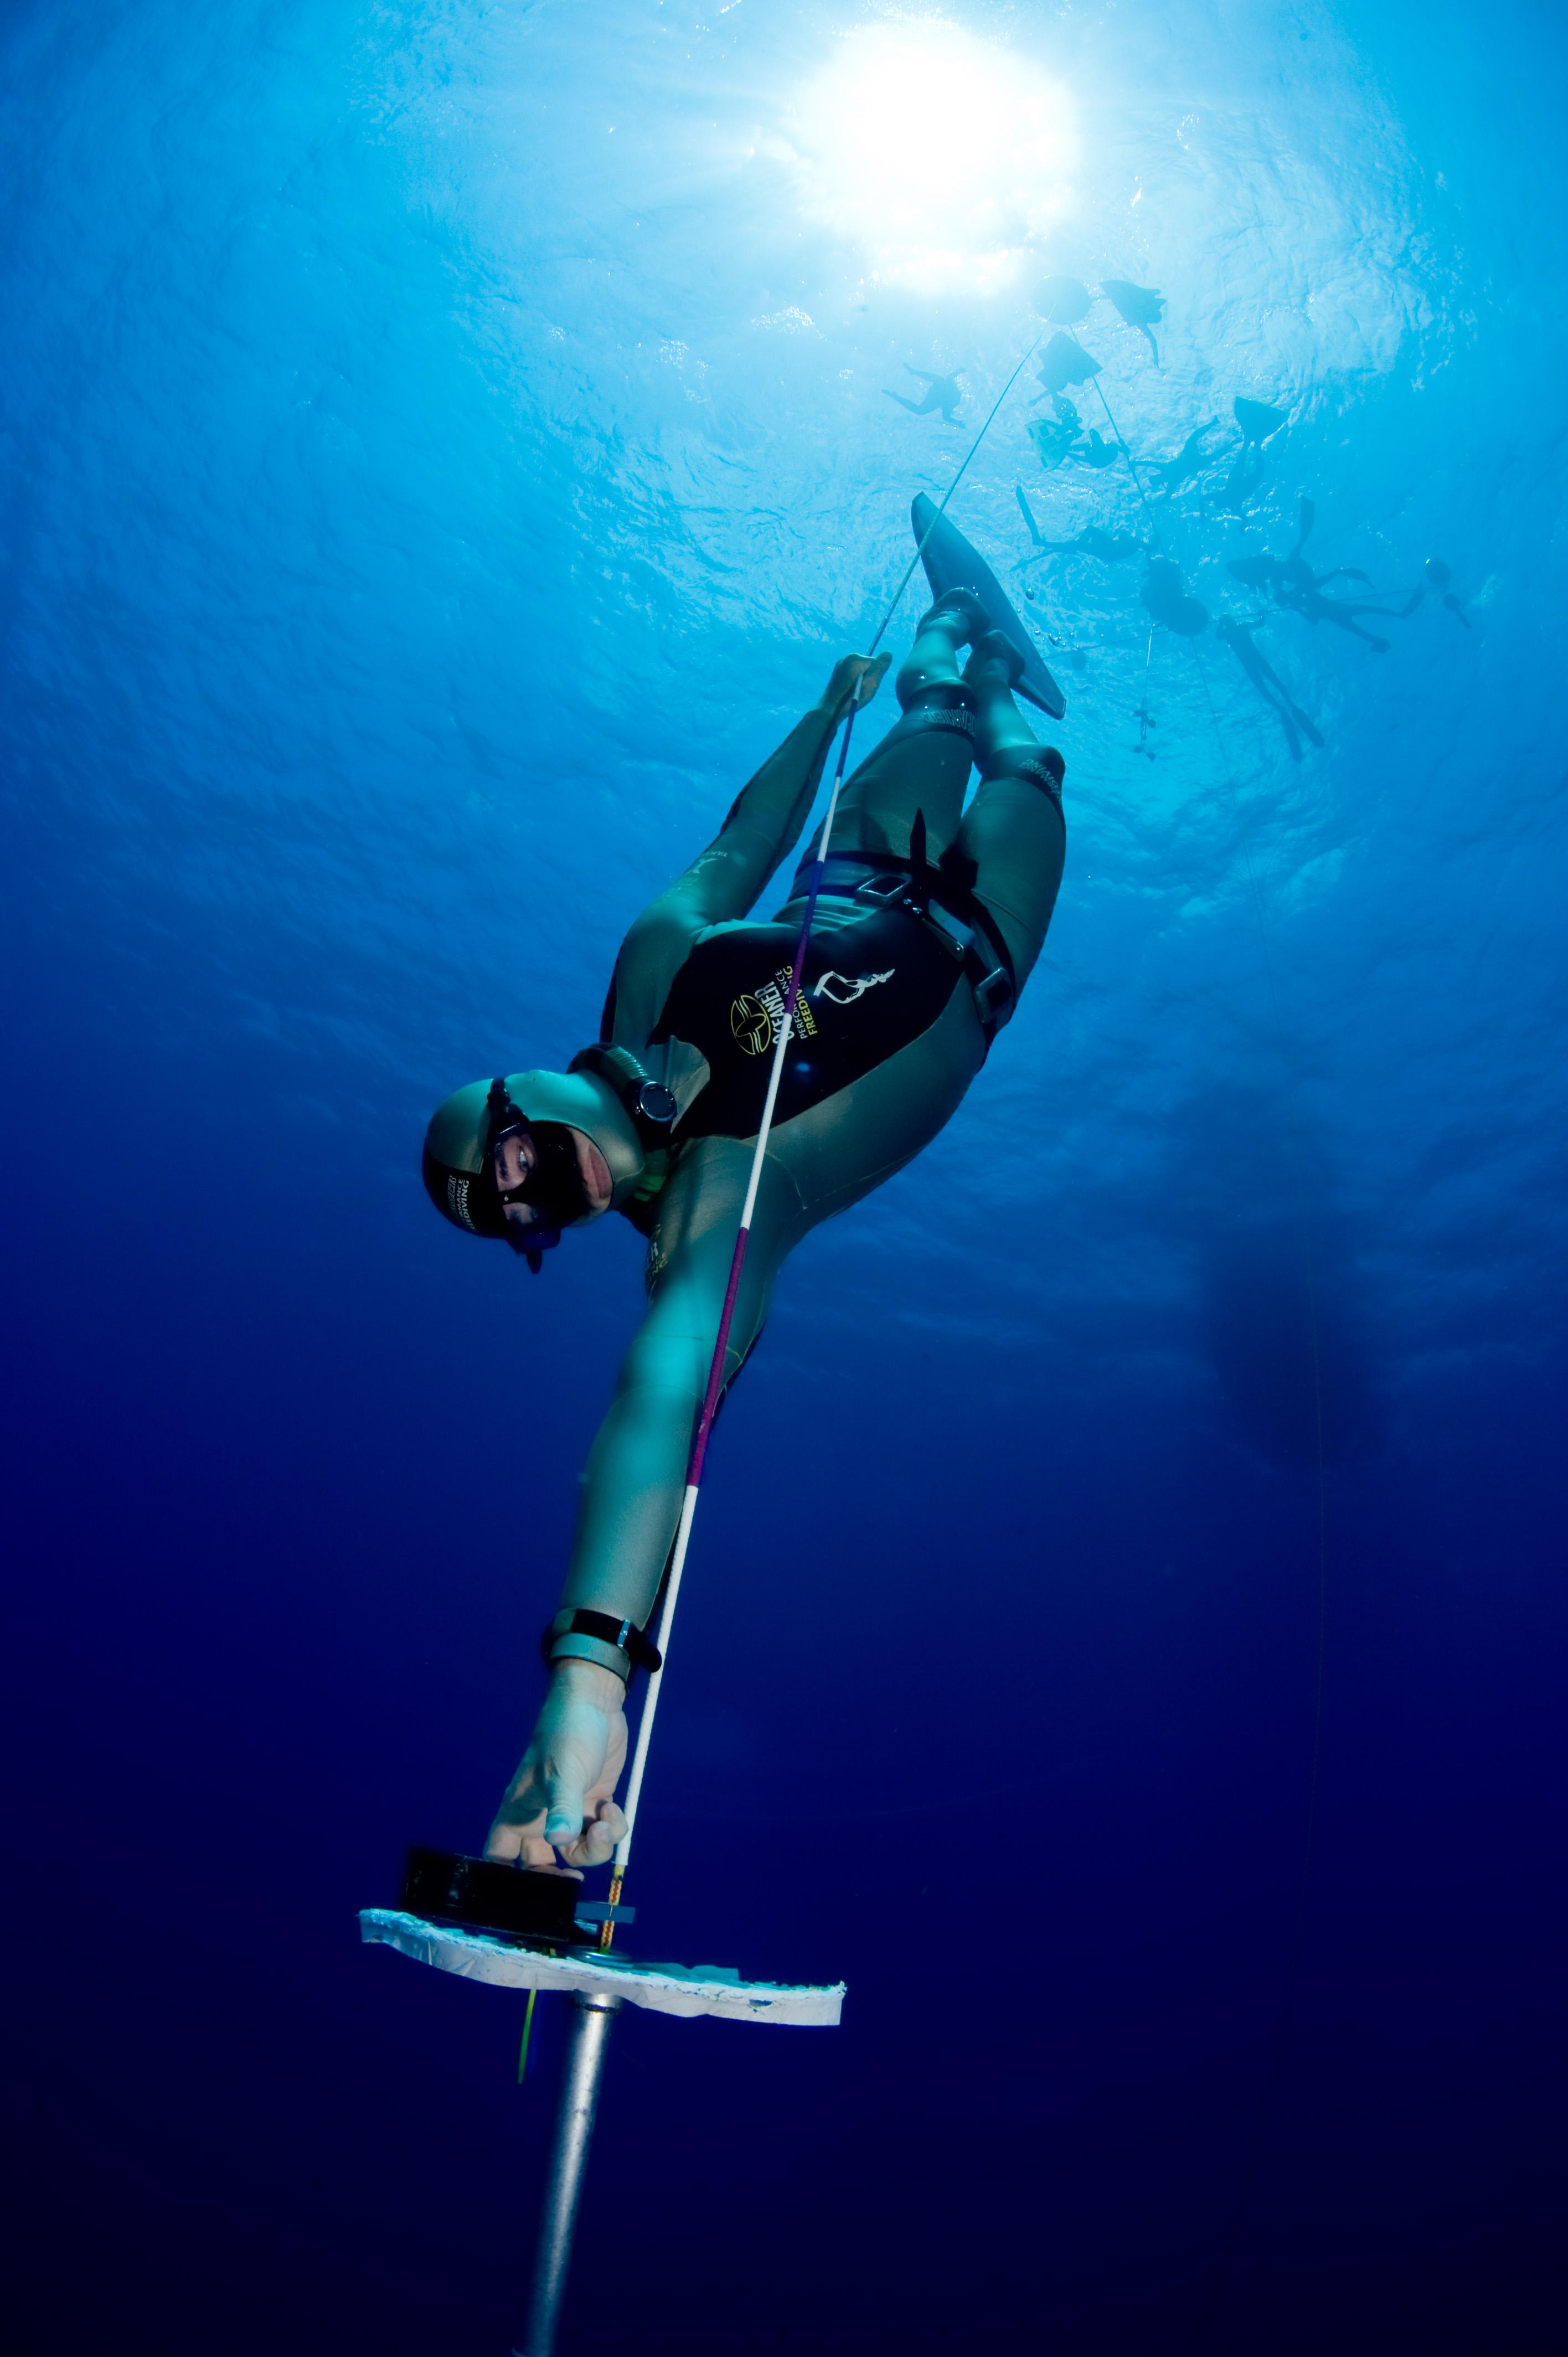 free diving 24 02 2015 1125x1688px 142 57 kb diving 04 09 2015 2832x4256